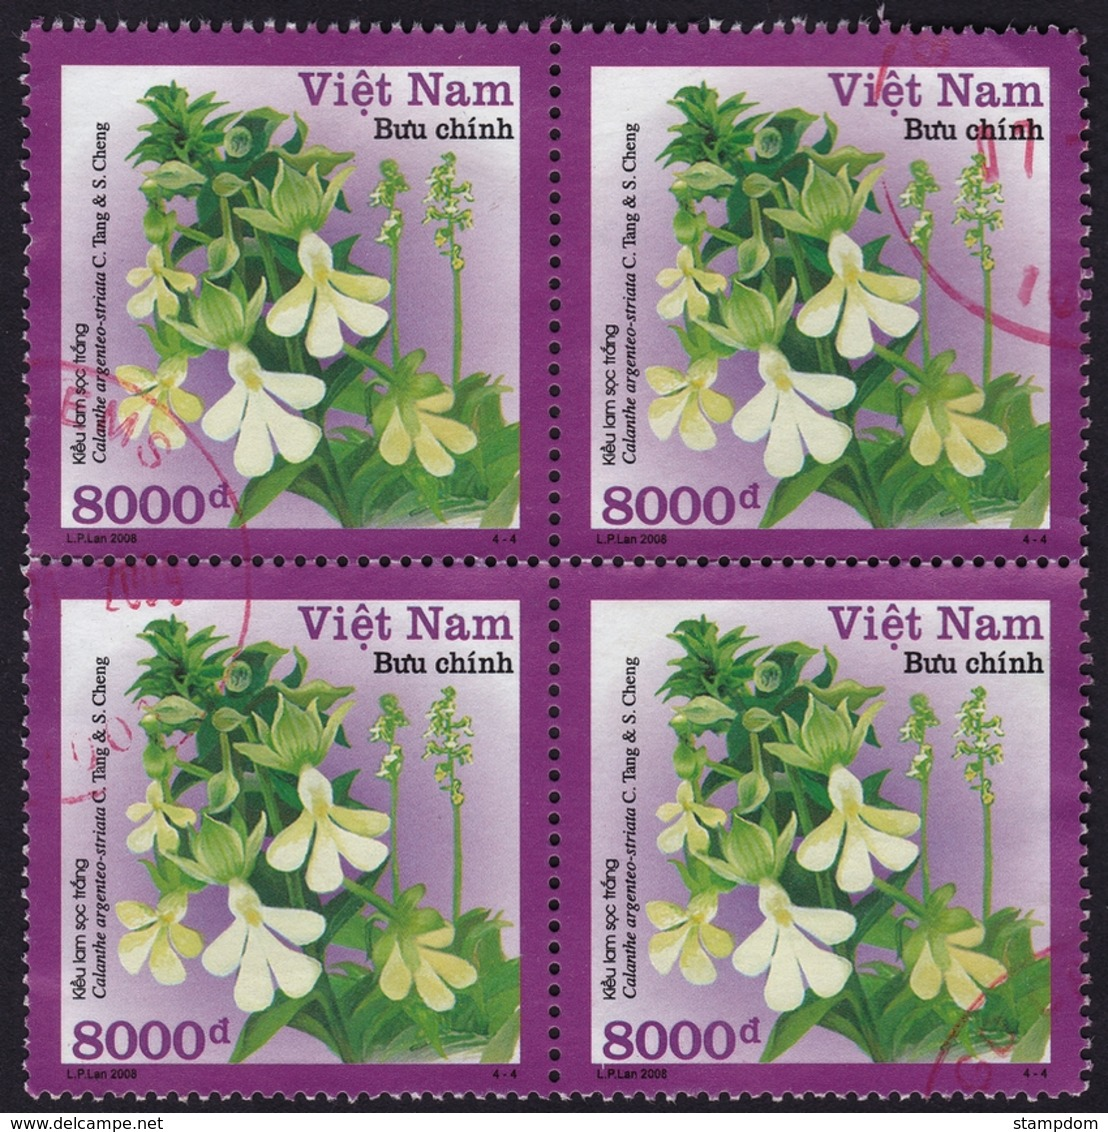 PDR VIETNAM 2008 Orchid 8000d BLOCK4 Sc#3325 USED @B588 - Vietnam